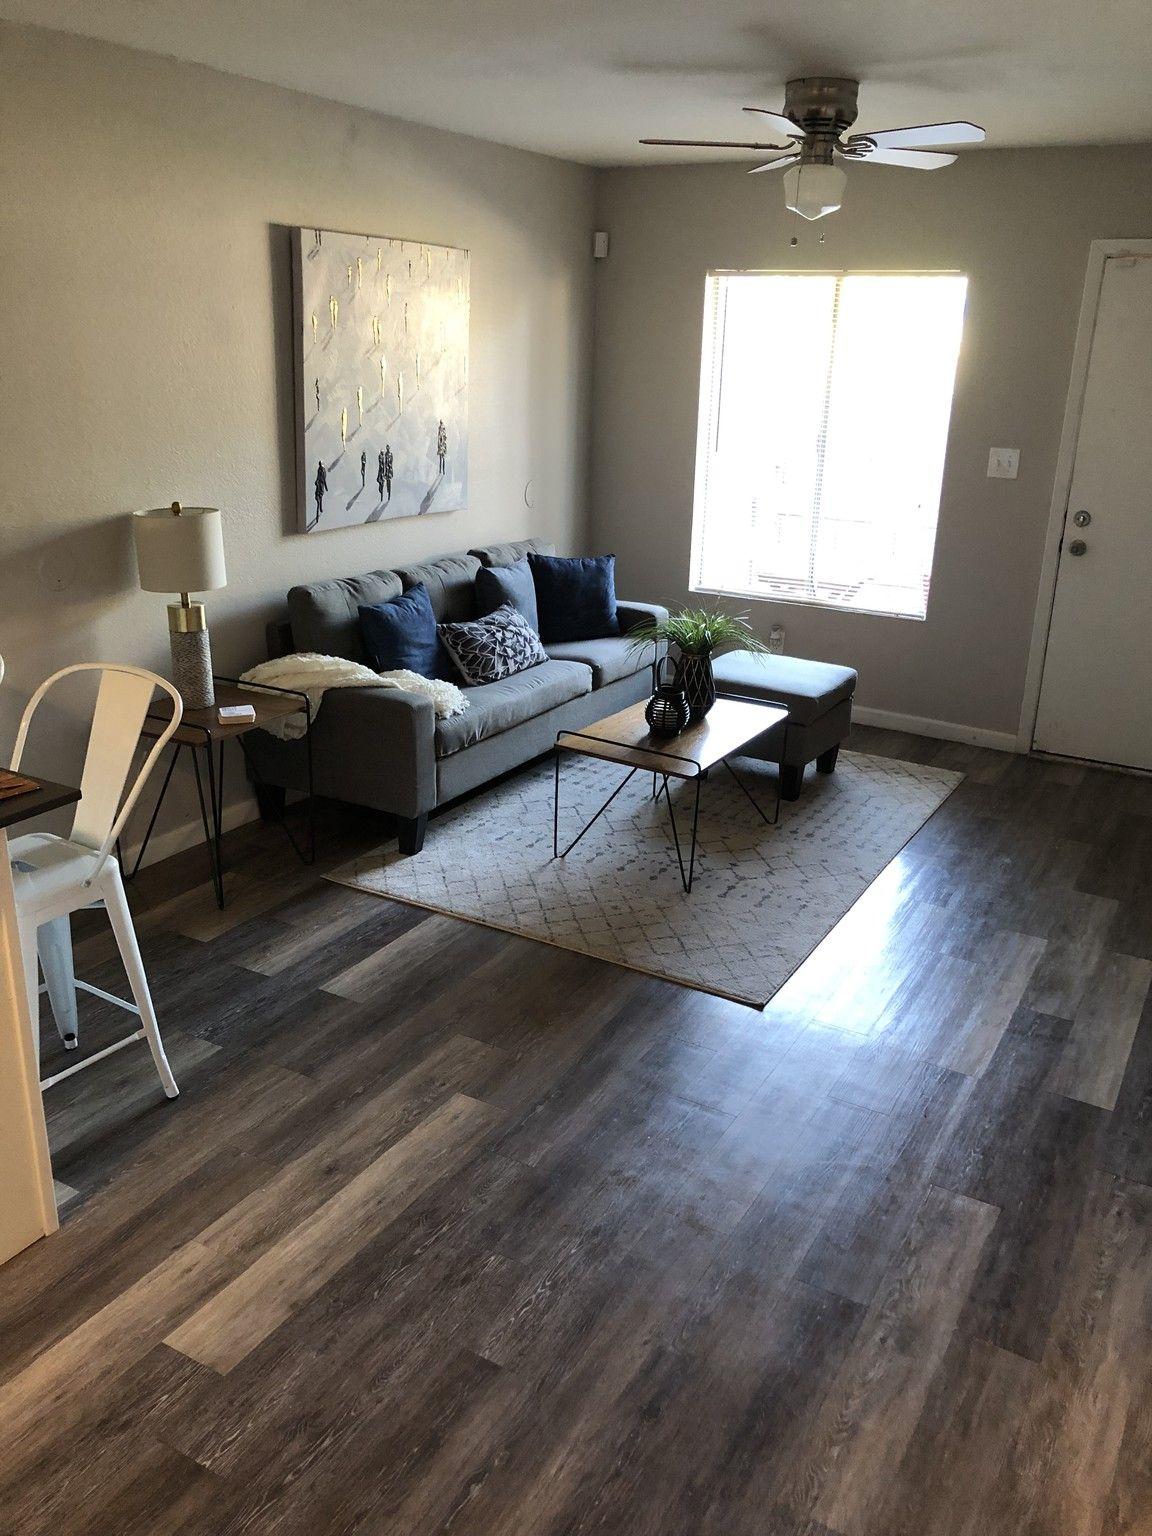 The Porter Apartments Tempe, AZ The